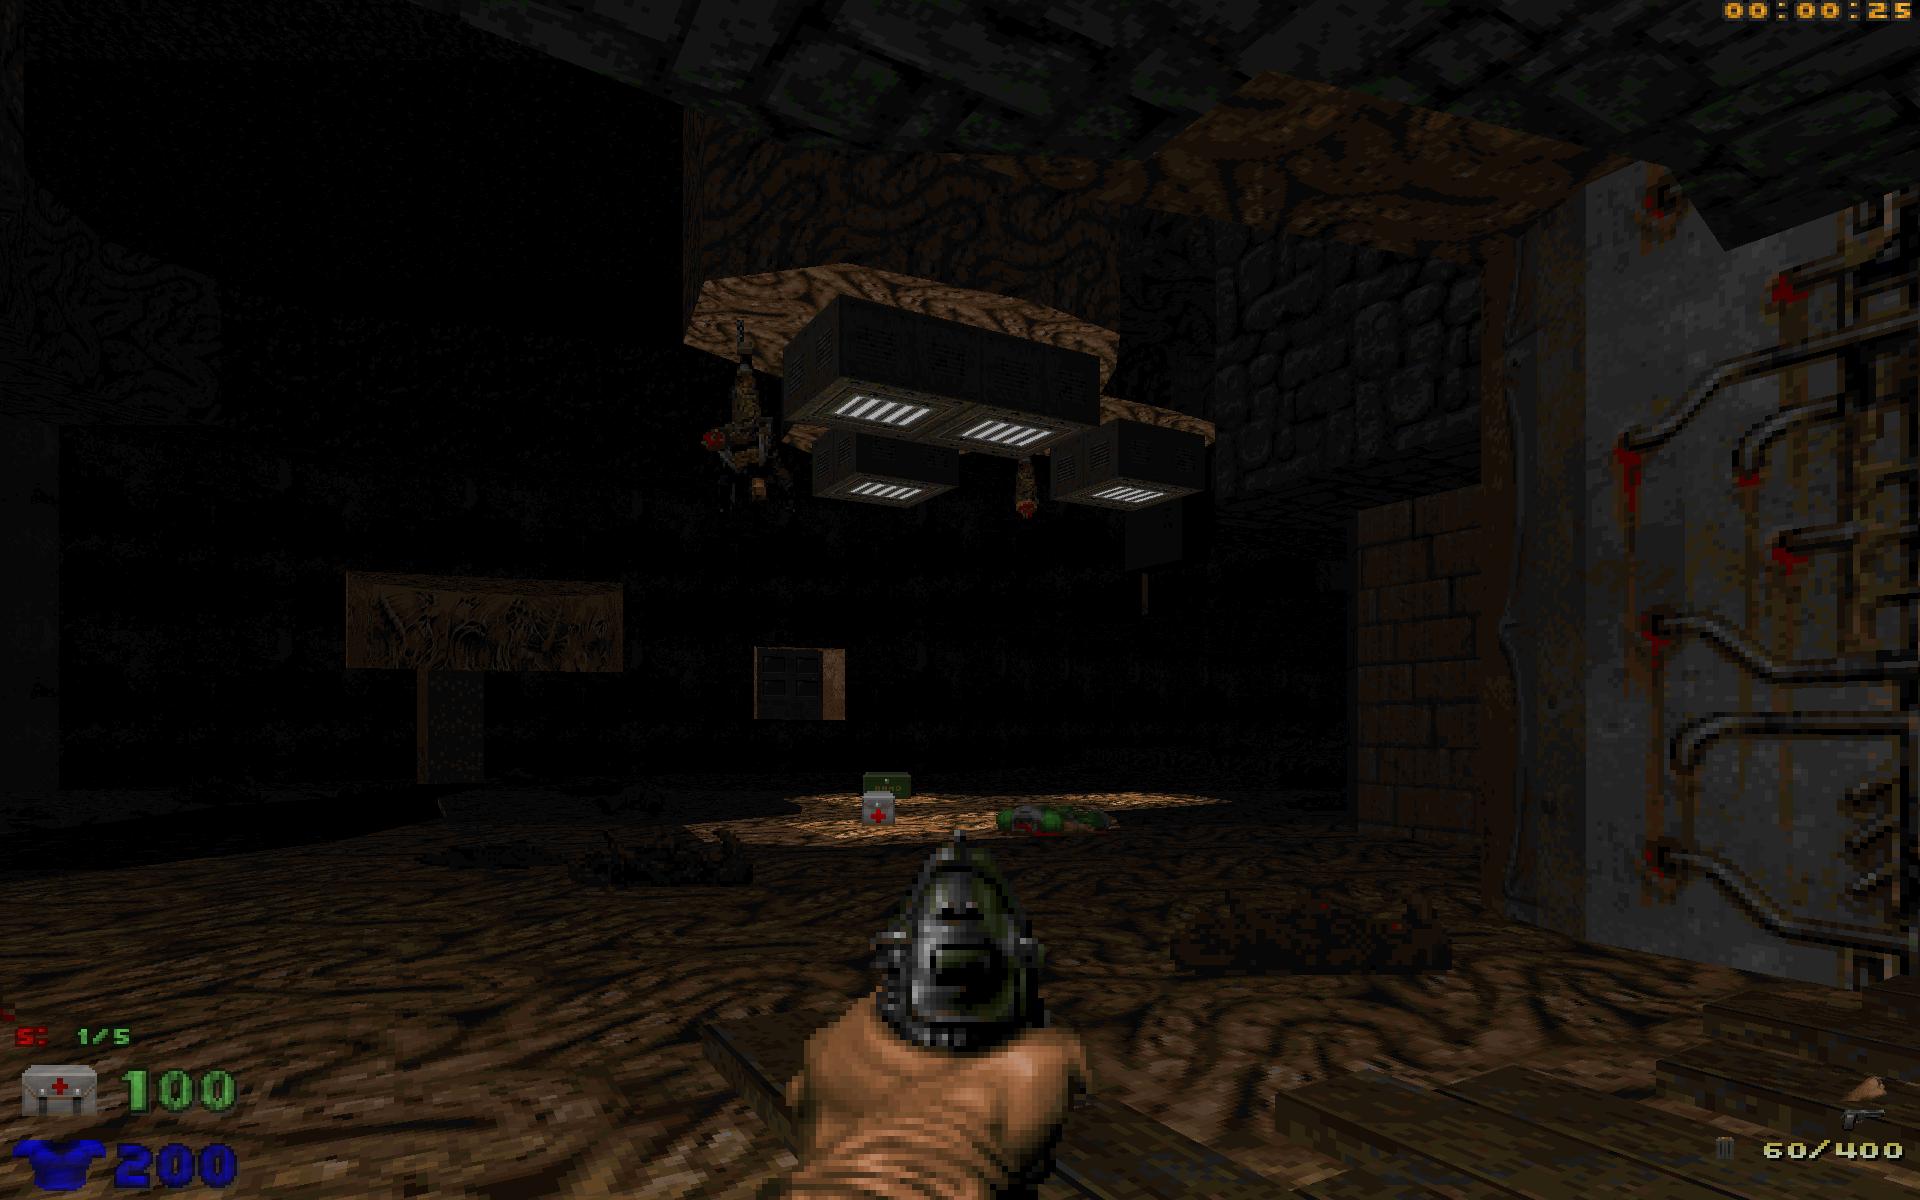 Screenshot_Doom_20210225_111903.png.f40606c840e08f61a8b95c3e98741faa.png